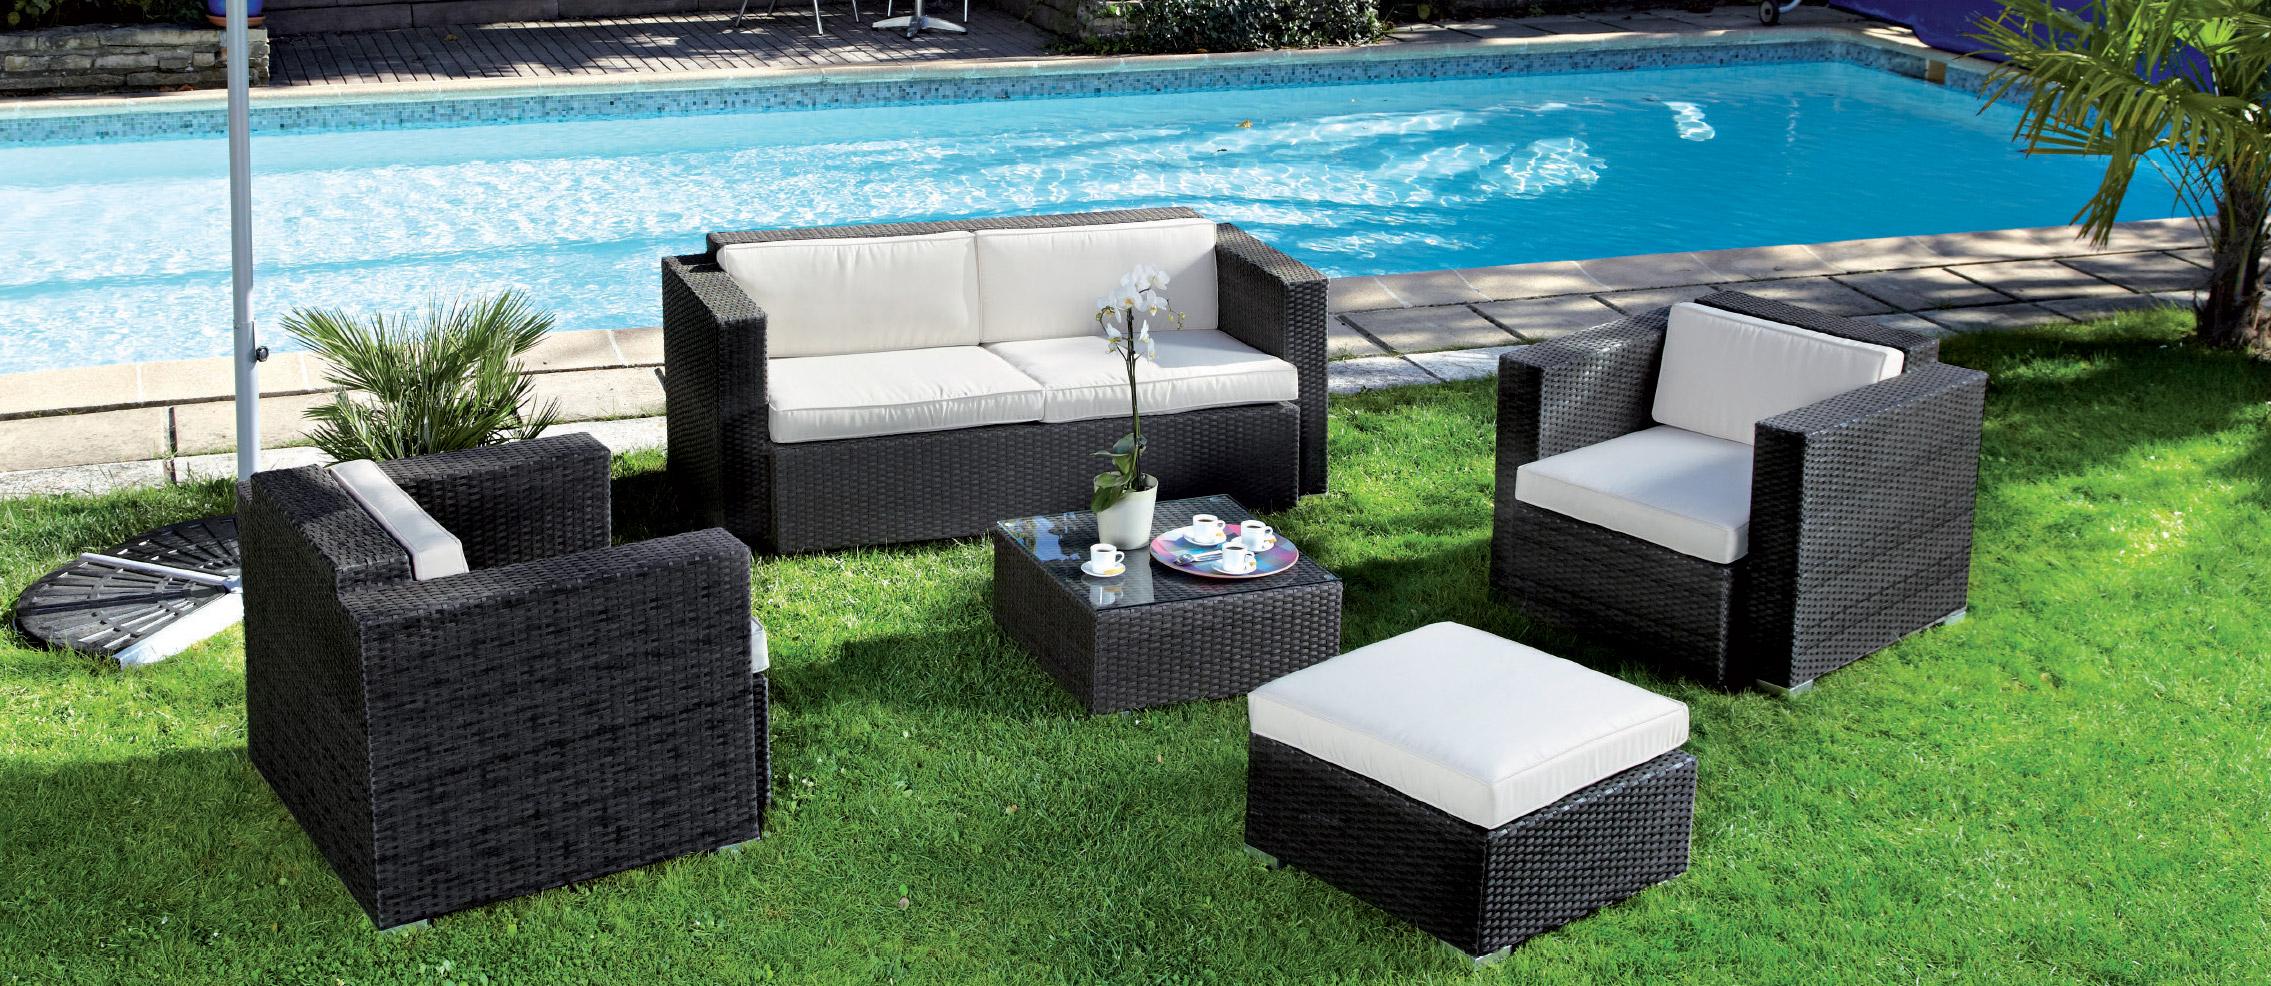 Salon De Jardin Resine Solde Concept - Idees Conception Jardin encequiconcerne Solde Mobilier De Jardin